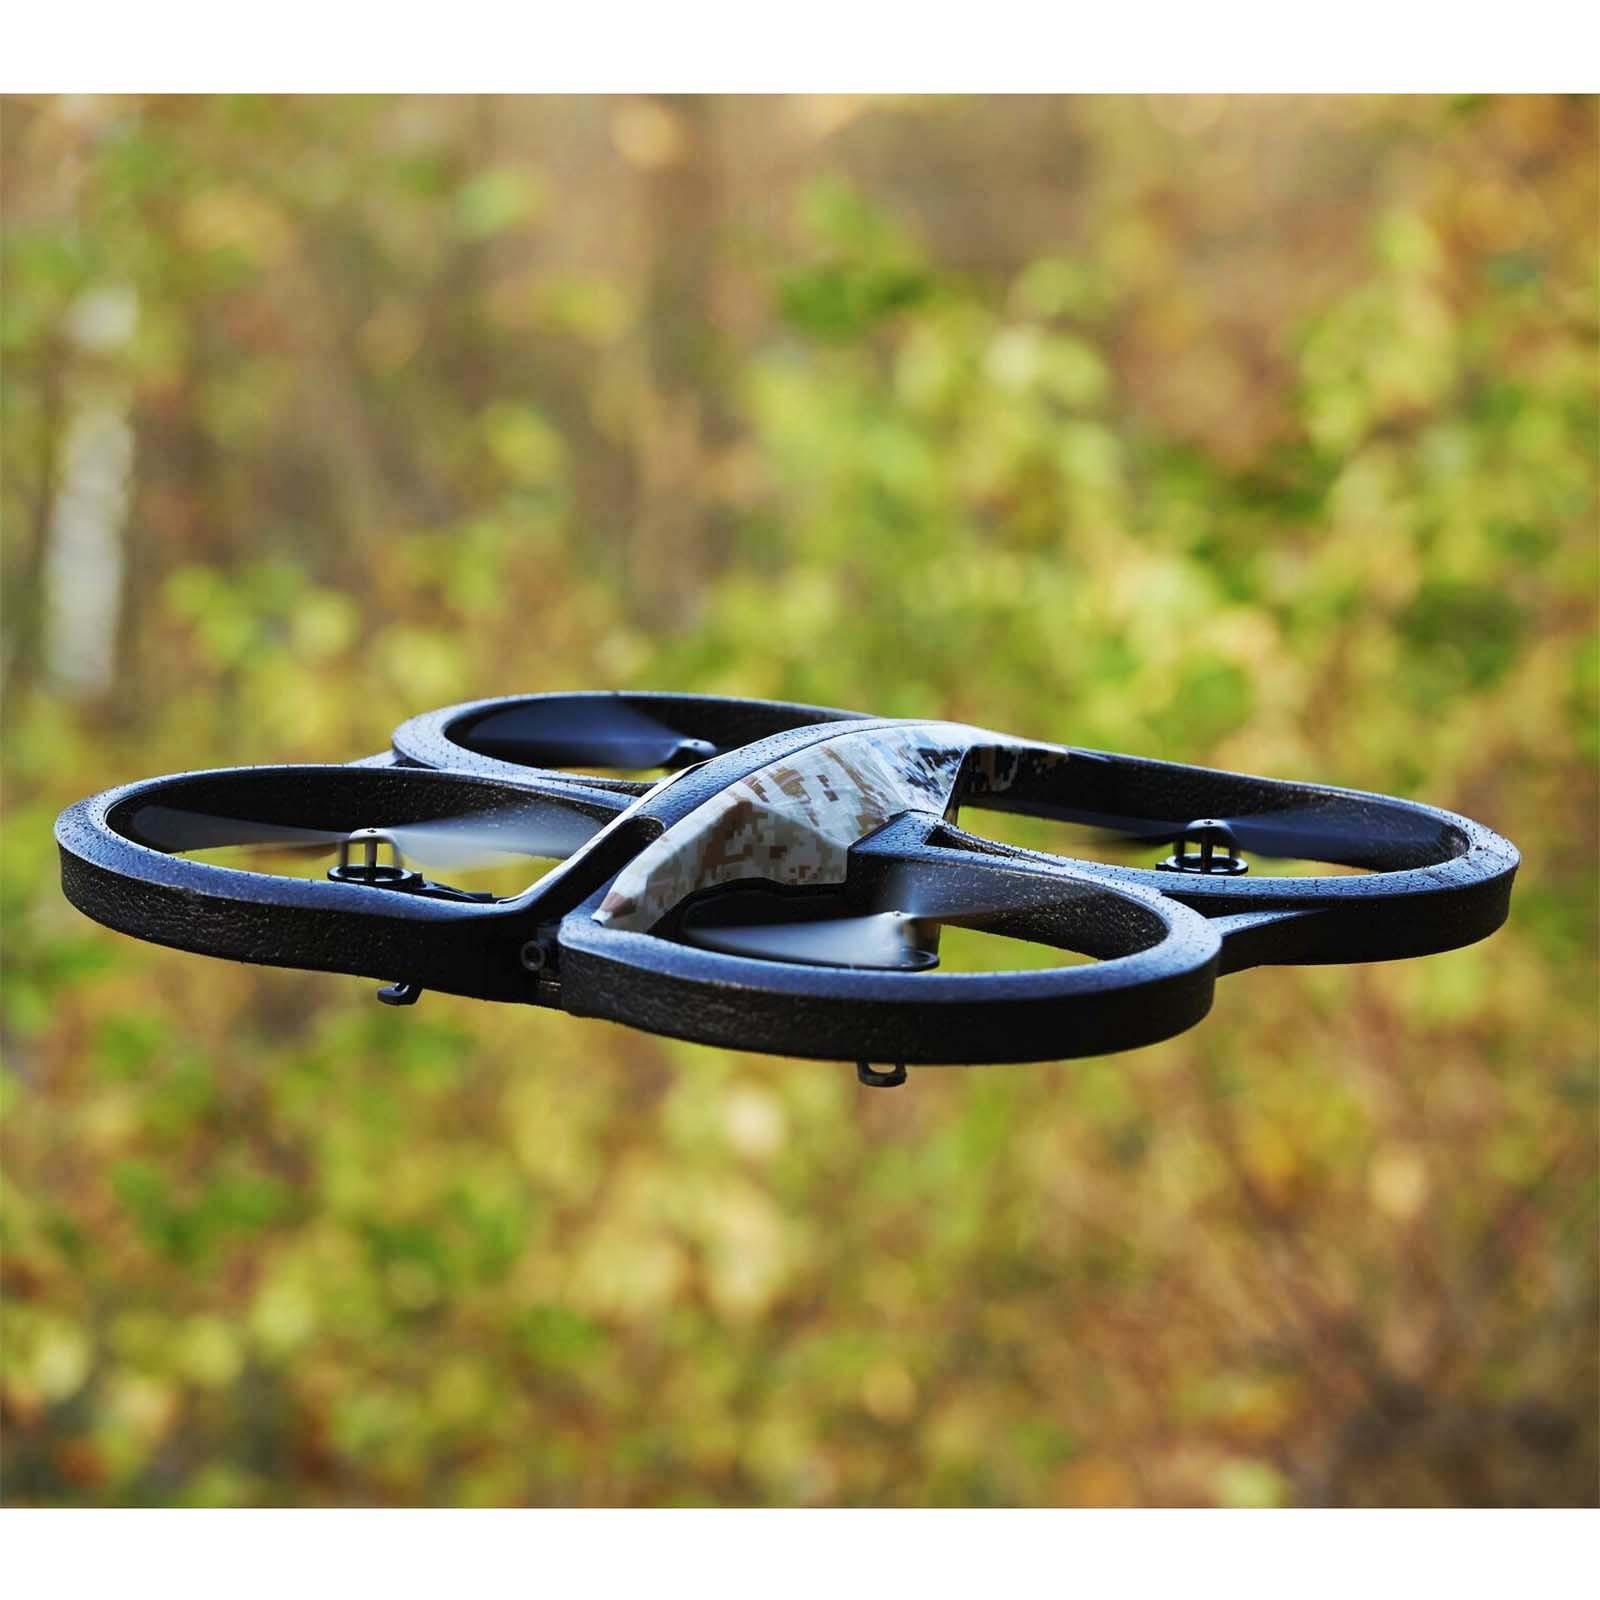 parrot ar drone 2 0 elite edition tanga. Black Bedroom Furniture Sets. Home Design Ideas